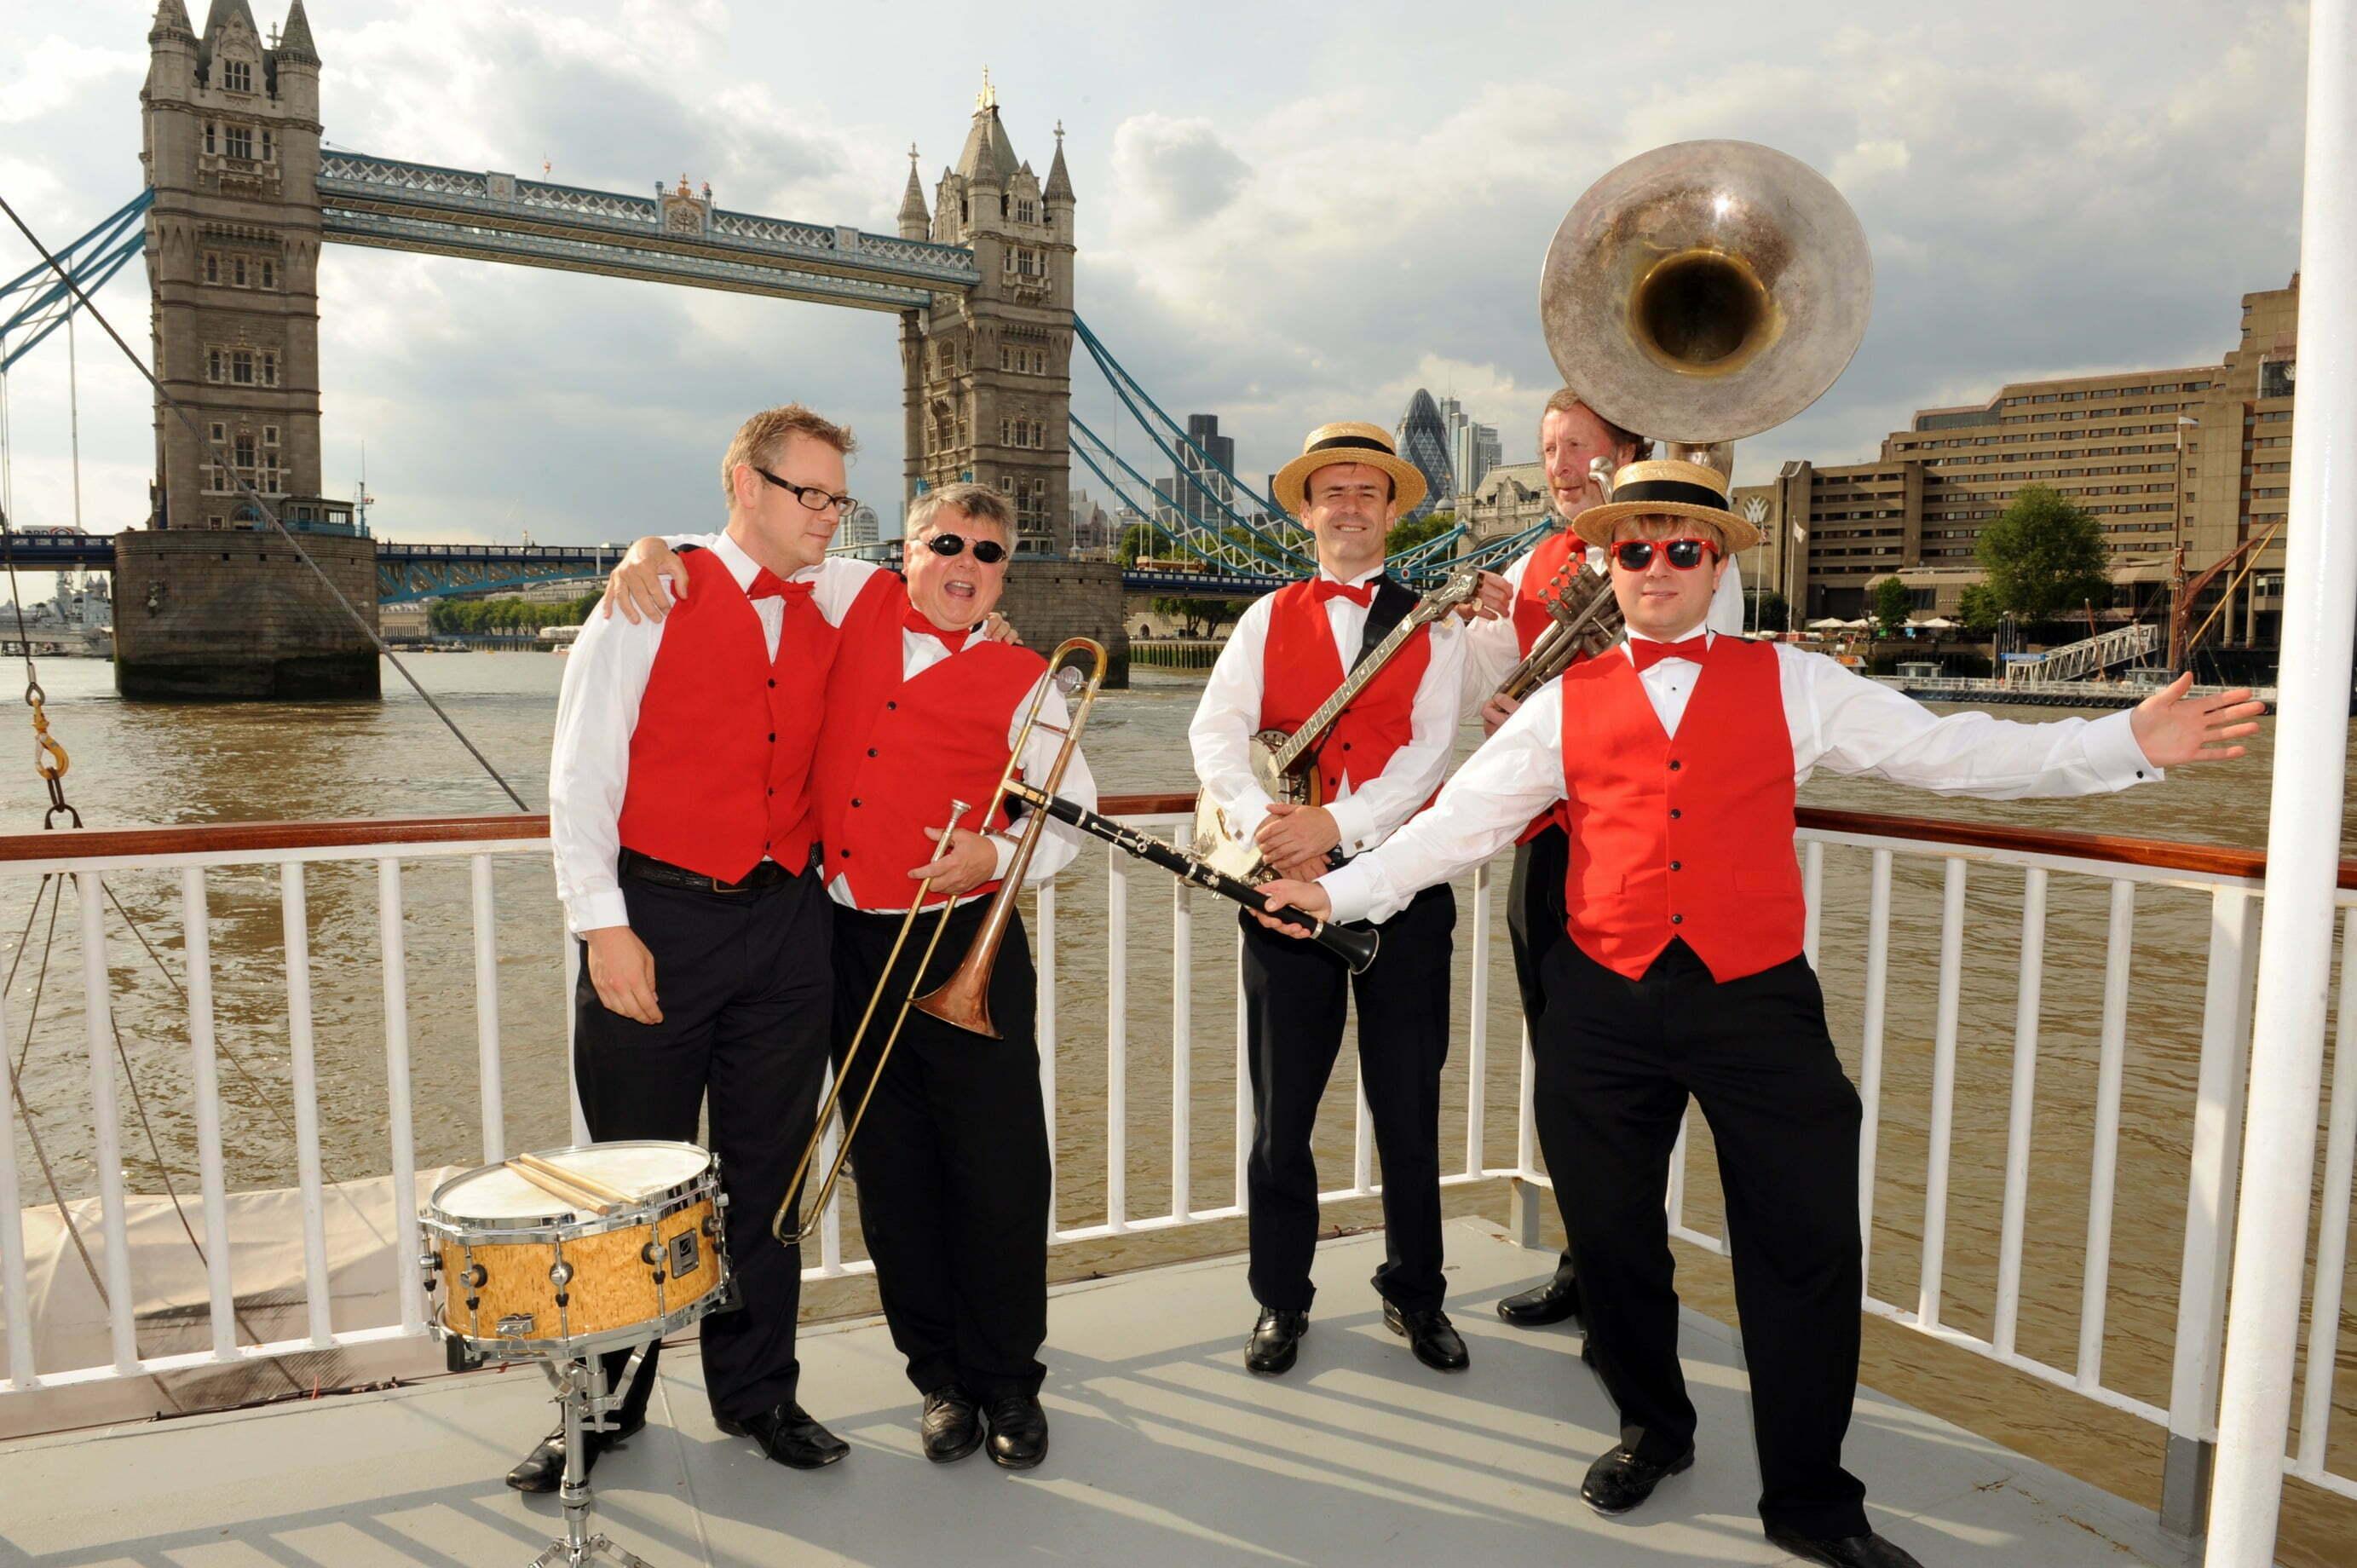 wedding band hire